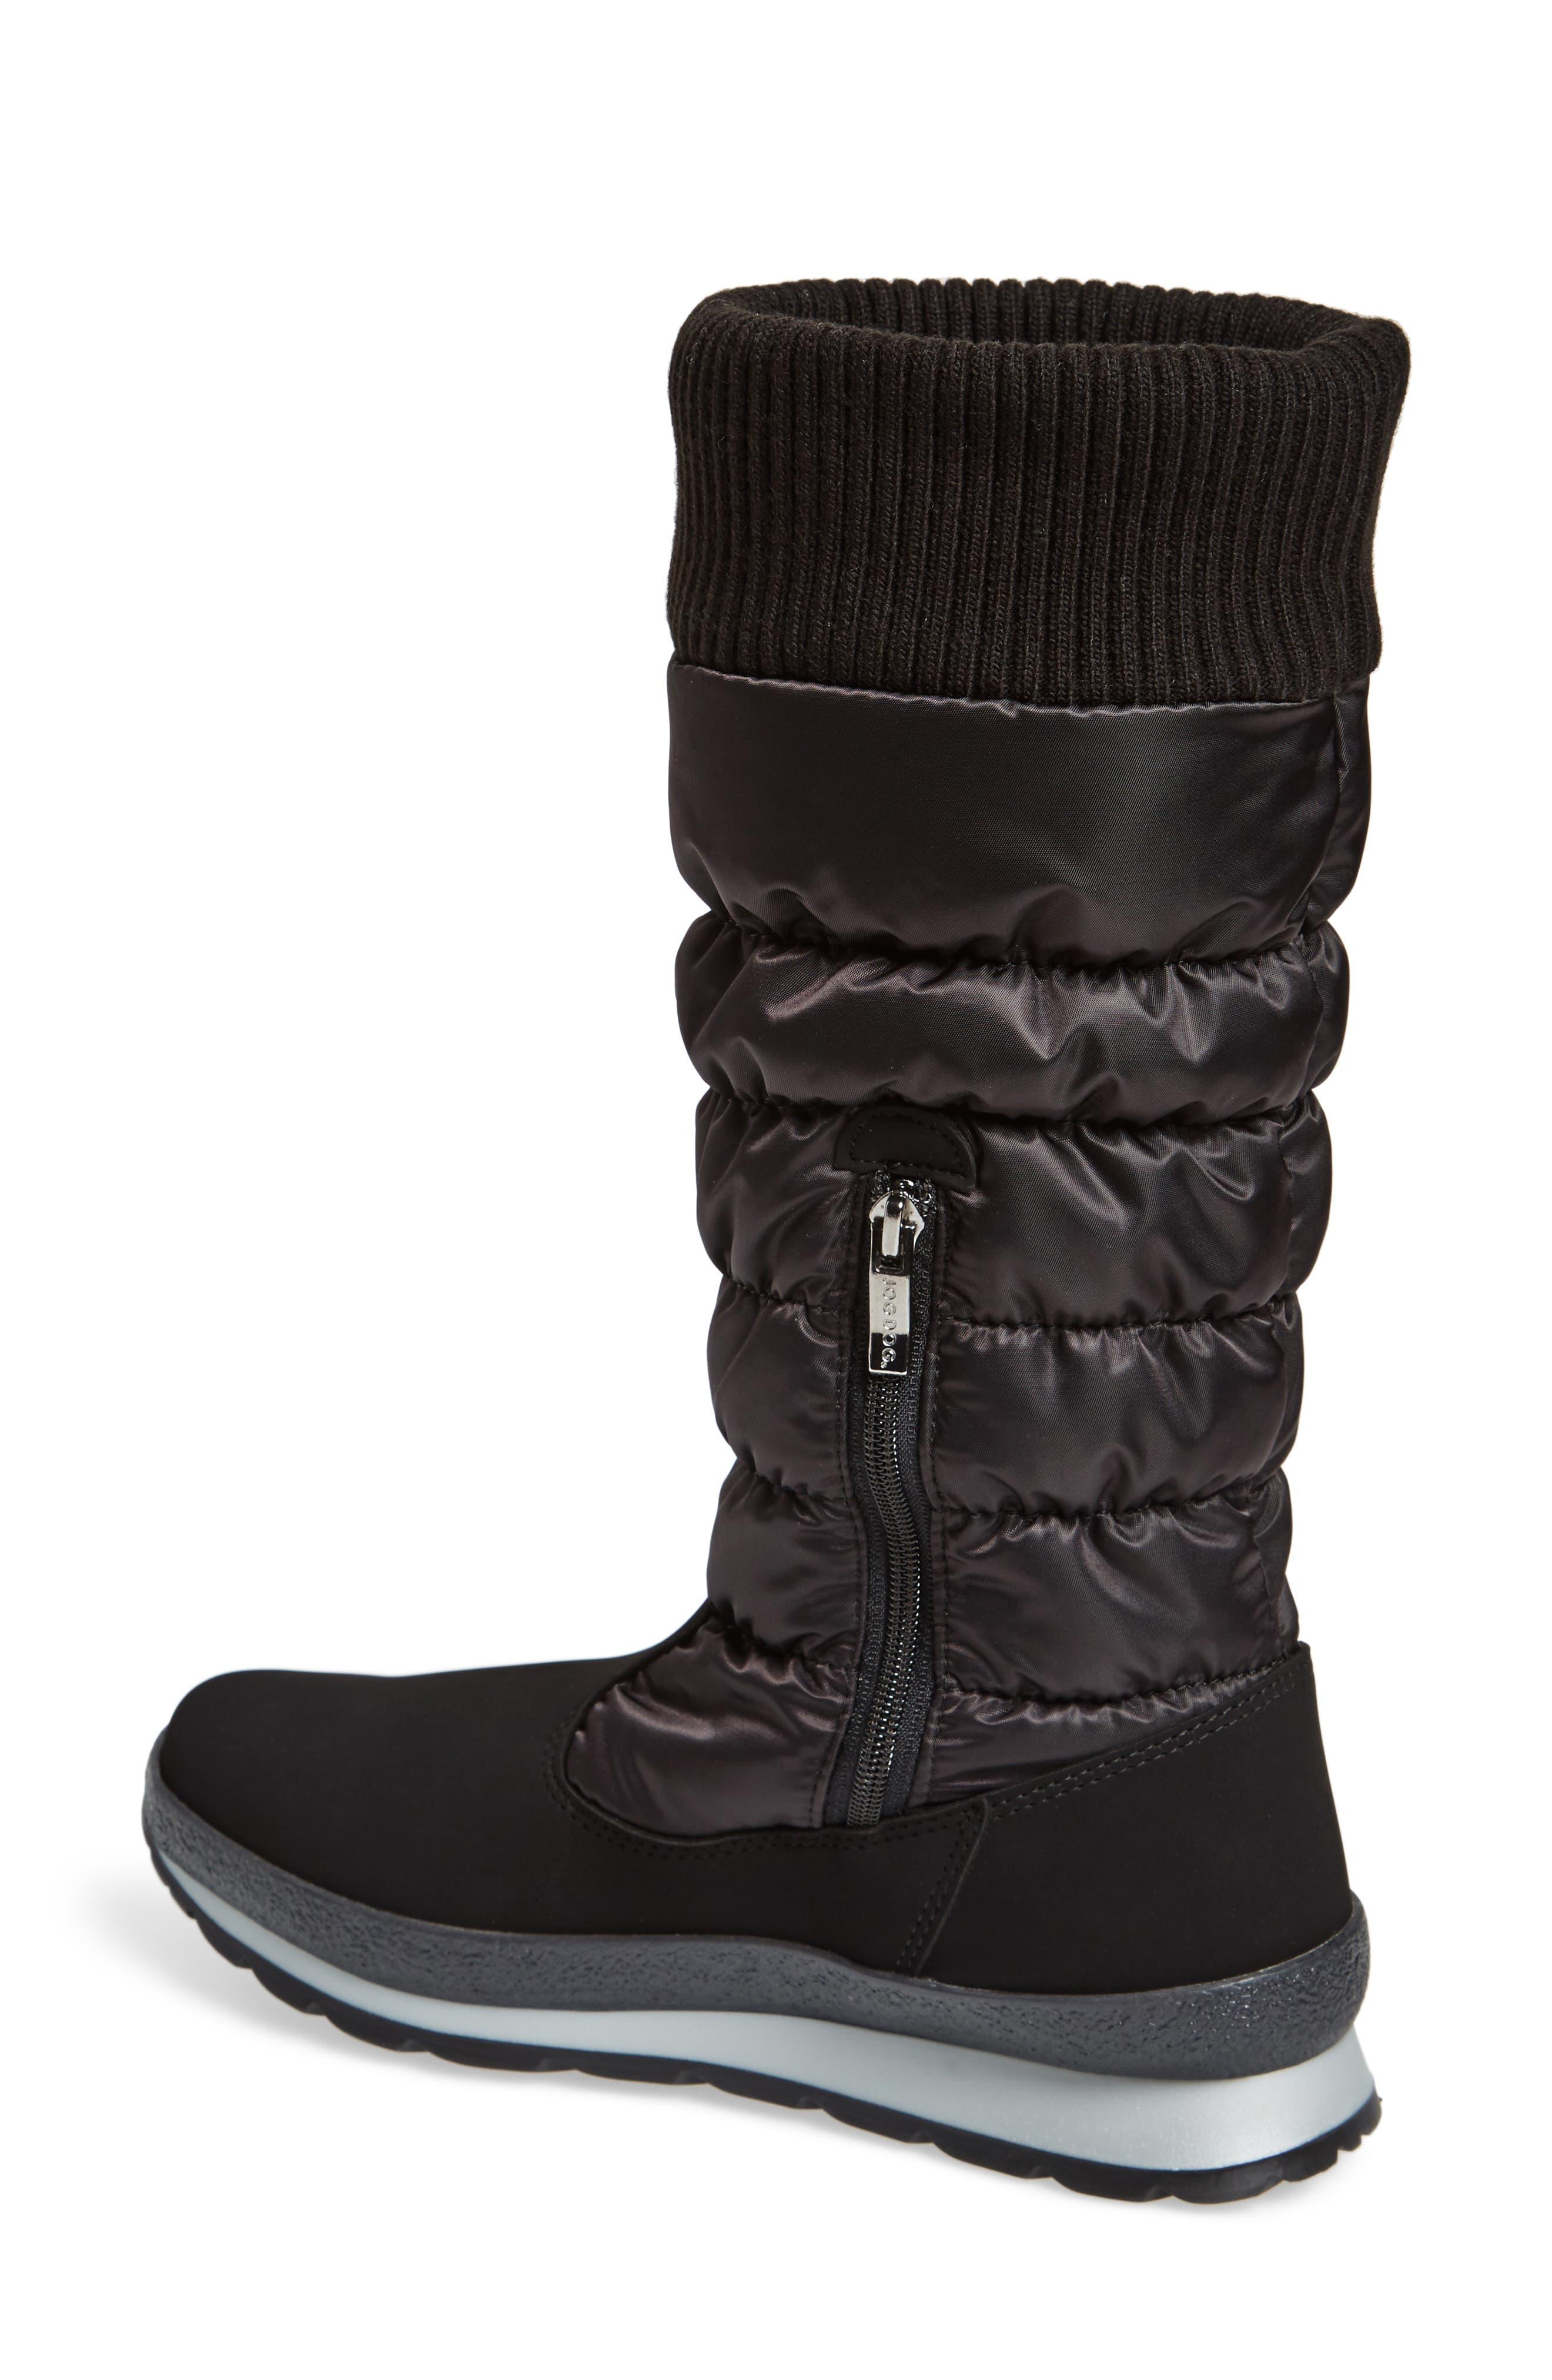 St. Anton Waterproof Winter Boot,                             Alternate thumbnail 2, color,                             BLACK/ ANTHRACITE